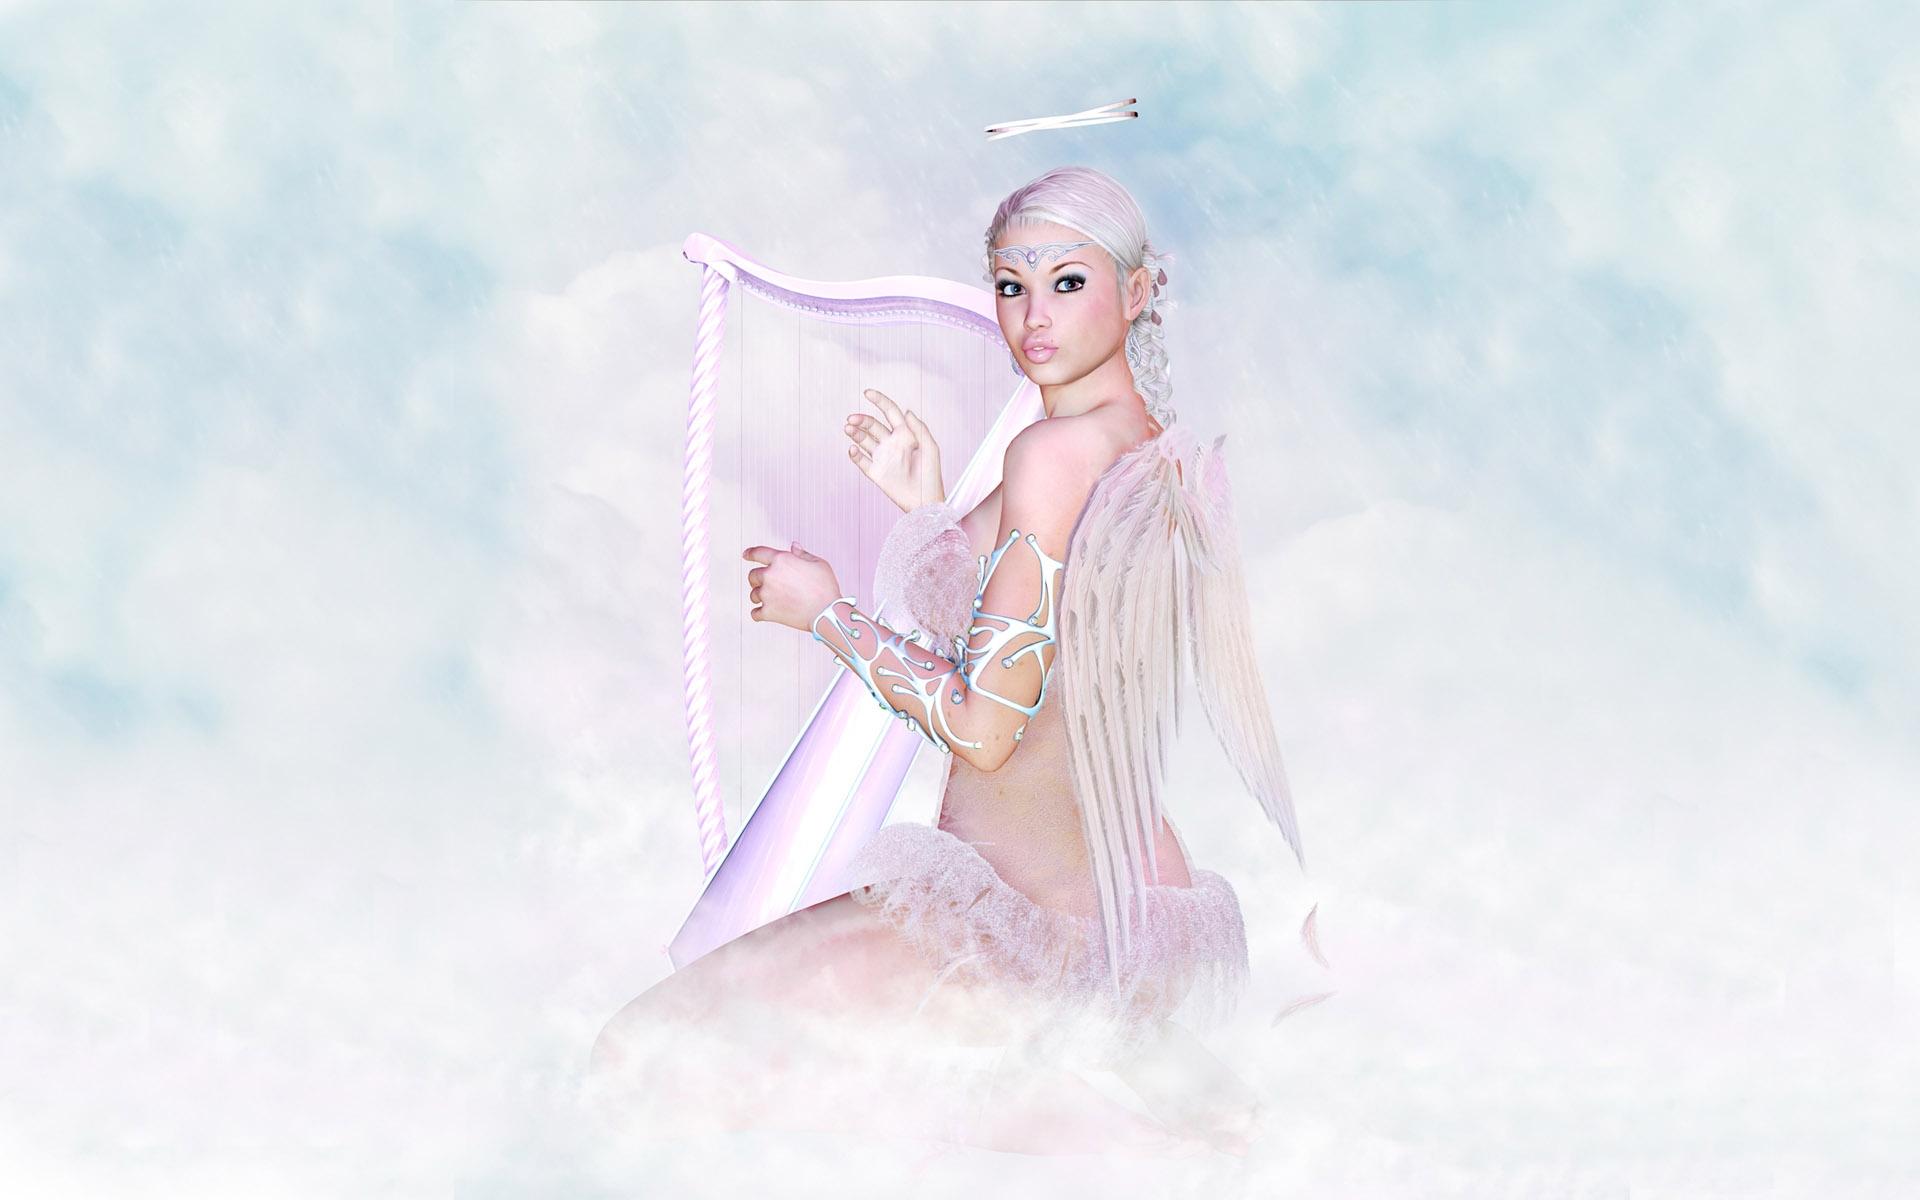 Angels Wallpapers For Desktop 3d: 3D Angels Wallpaper